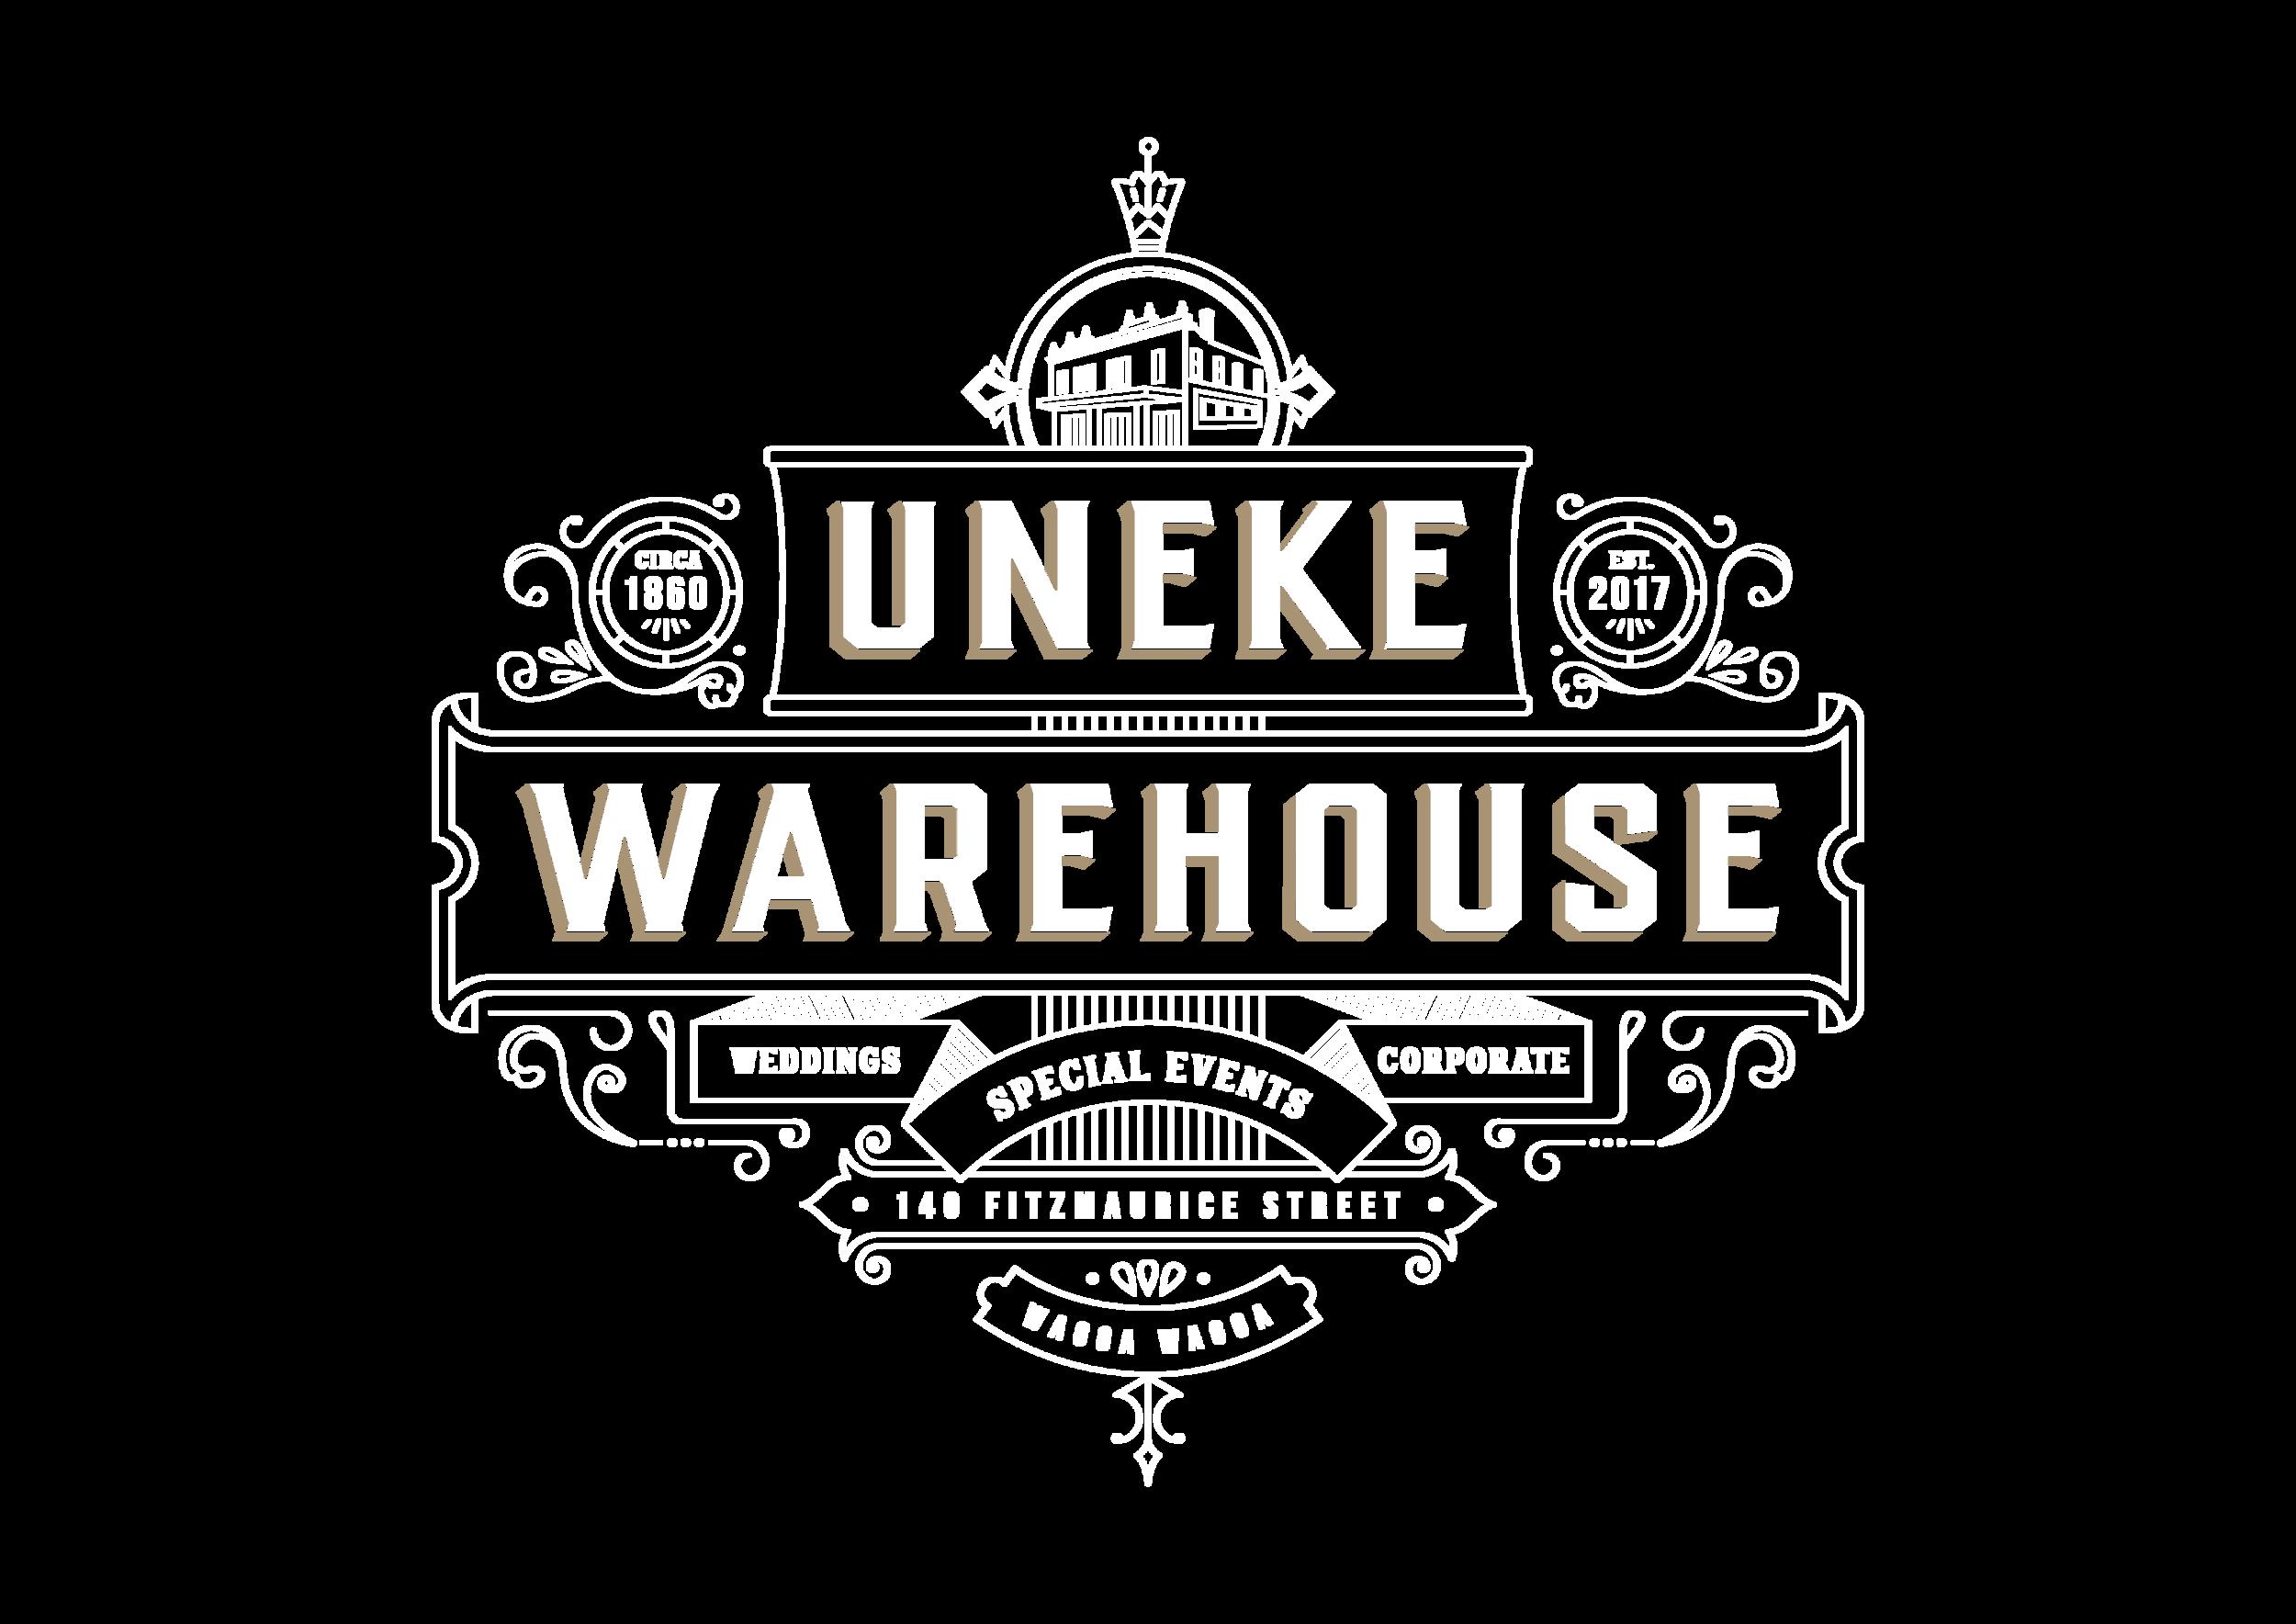 UnekeWarehouse_LogoRGB_2.png